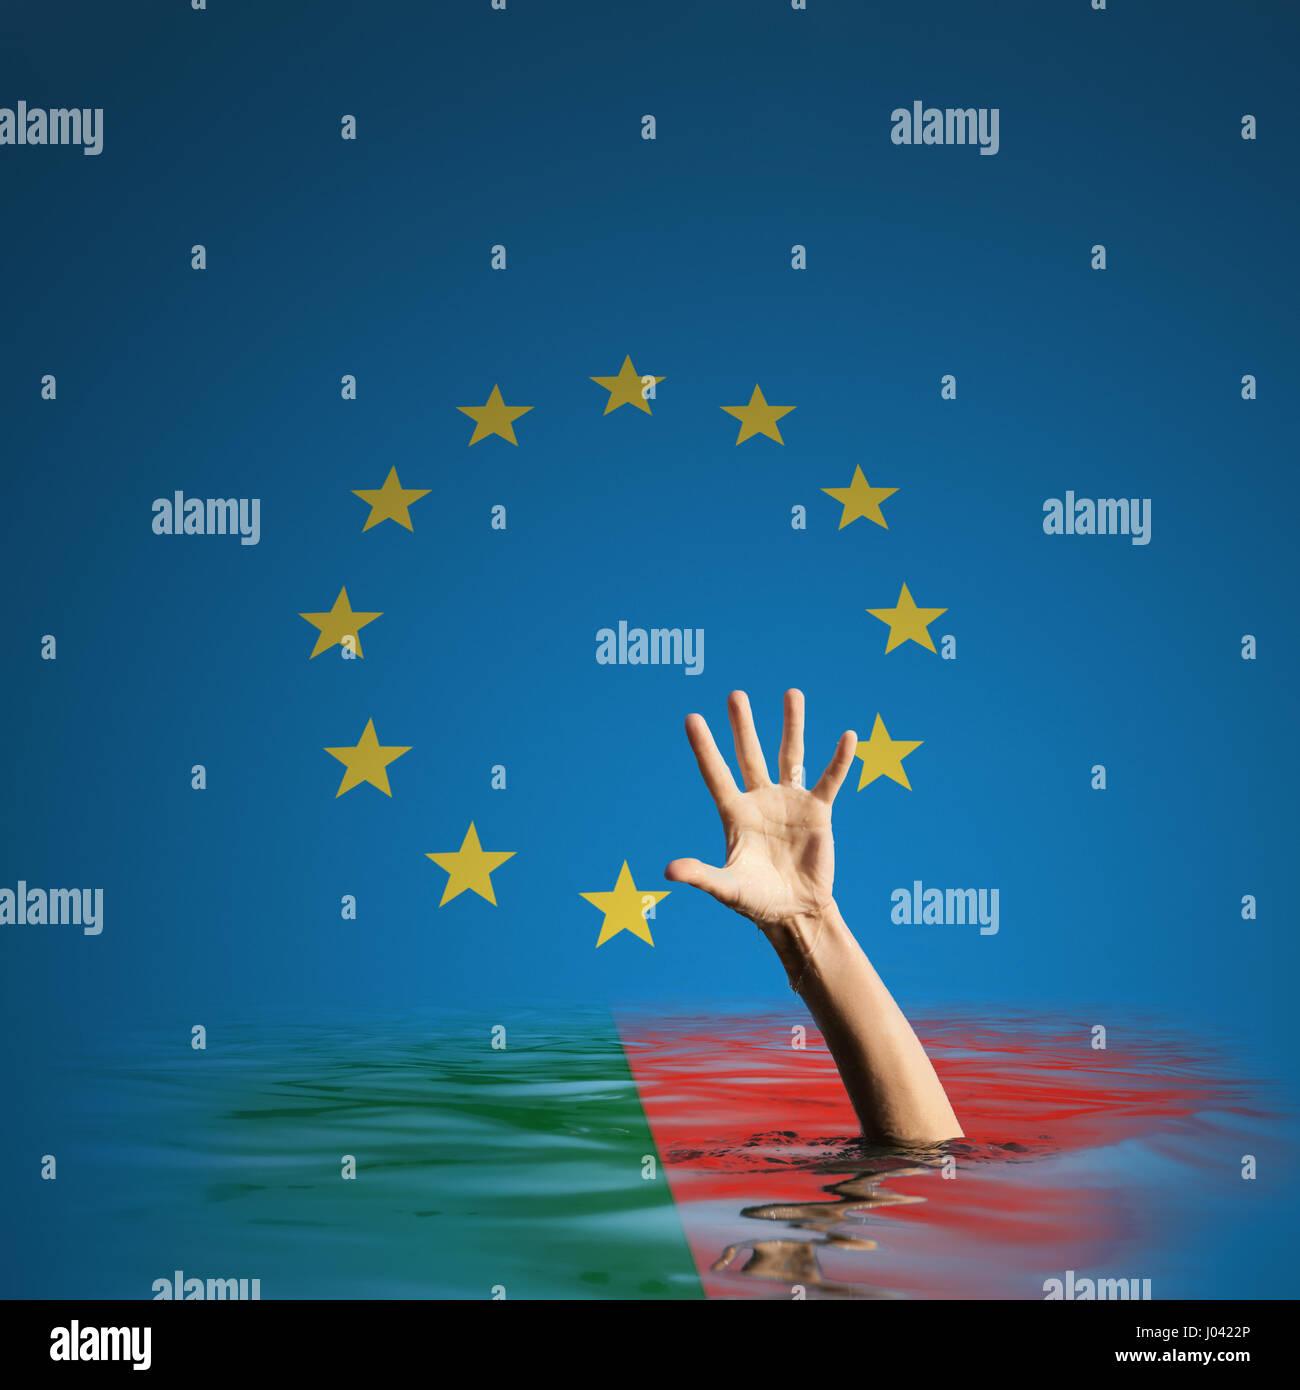 Portugal debt crisis in European Union 3d illustration - Stock Image